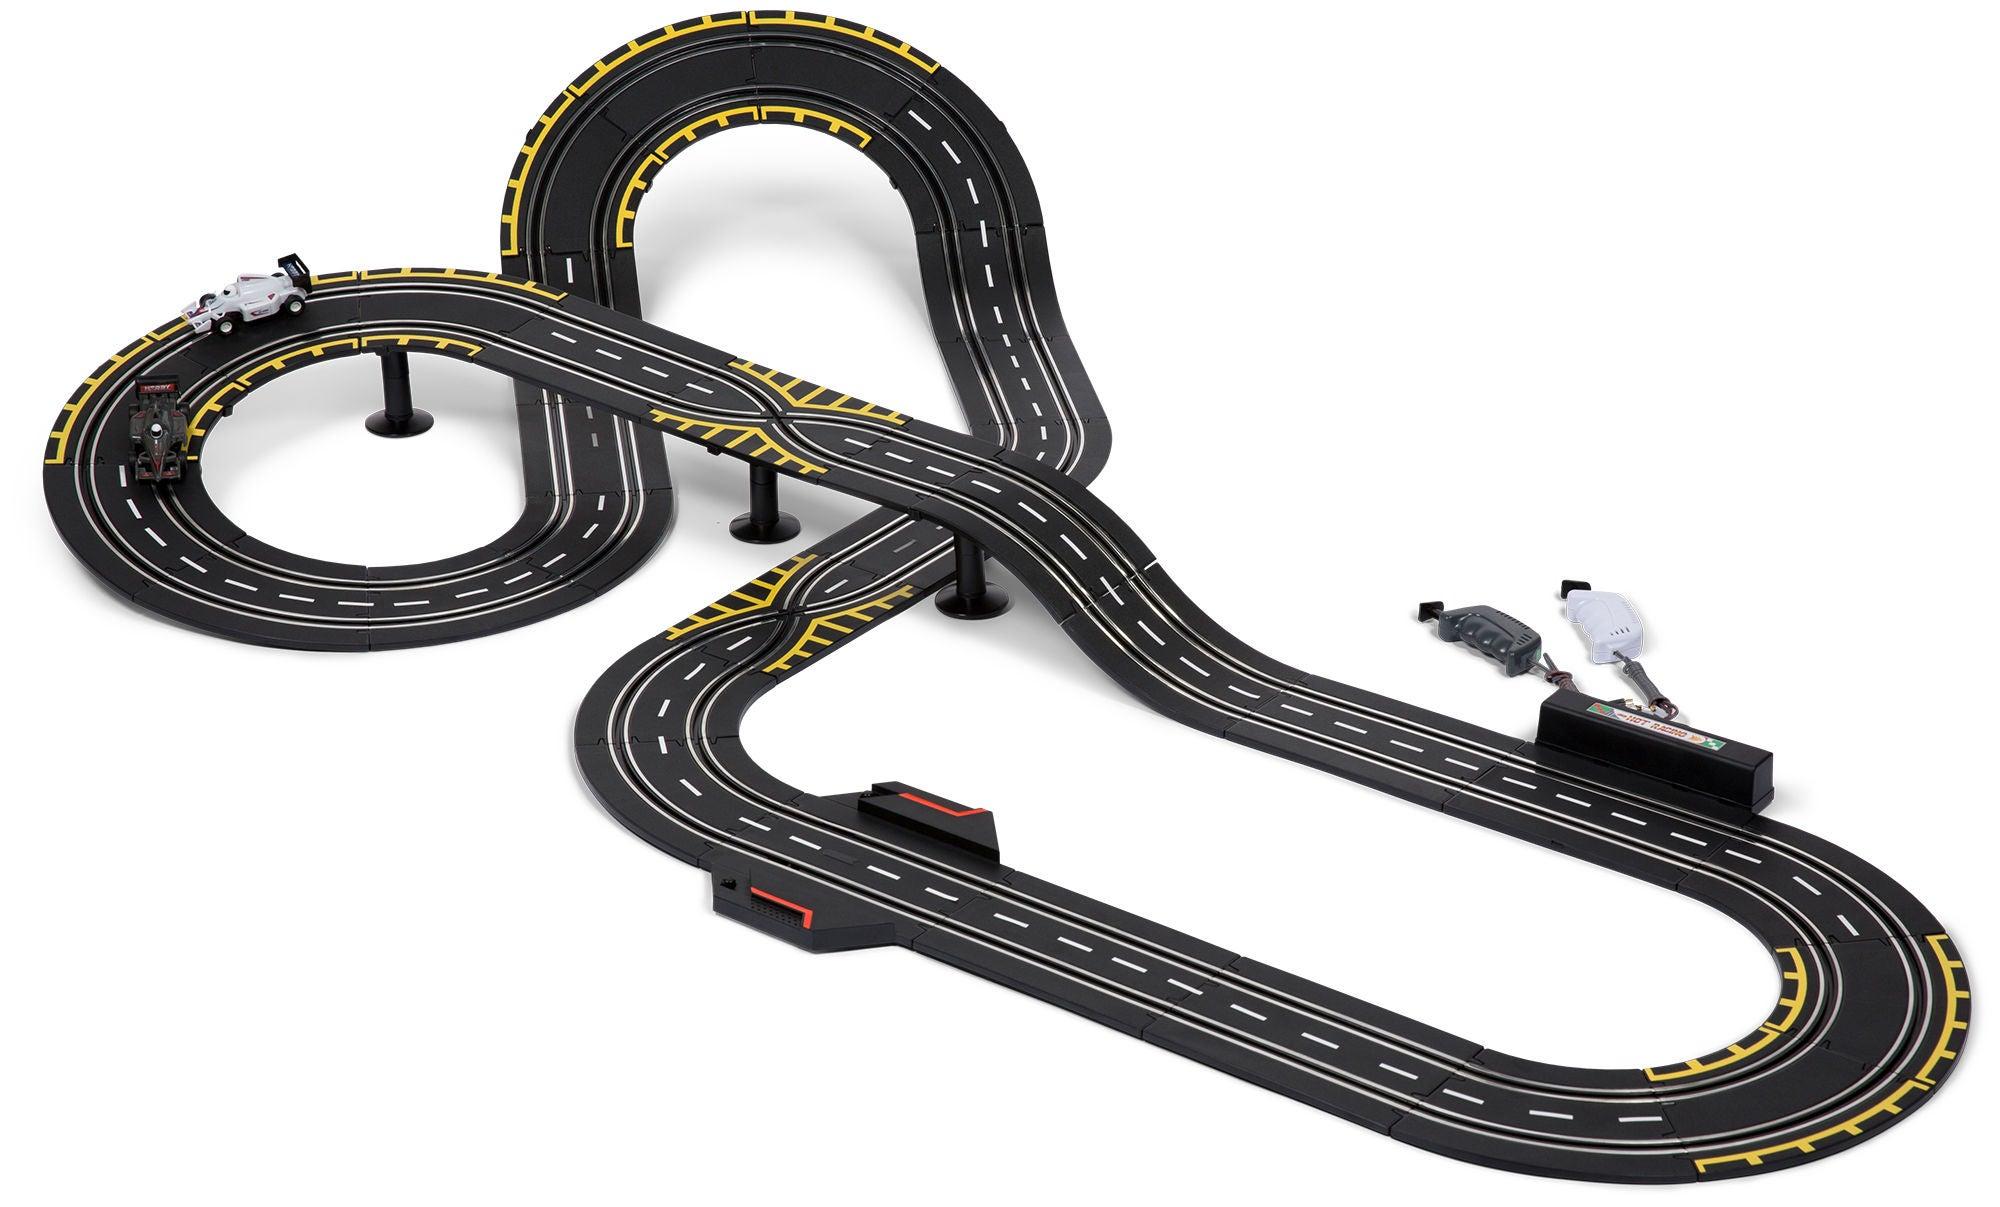 Alex's Garage Speed Racer F1 Racing Grand Prix Bilbana